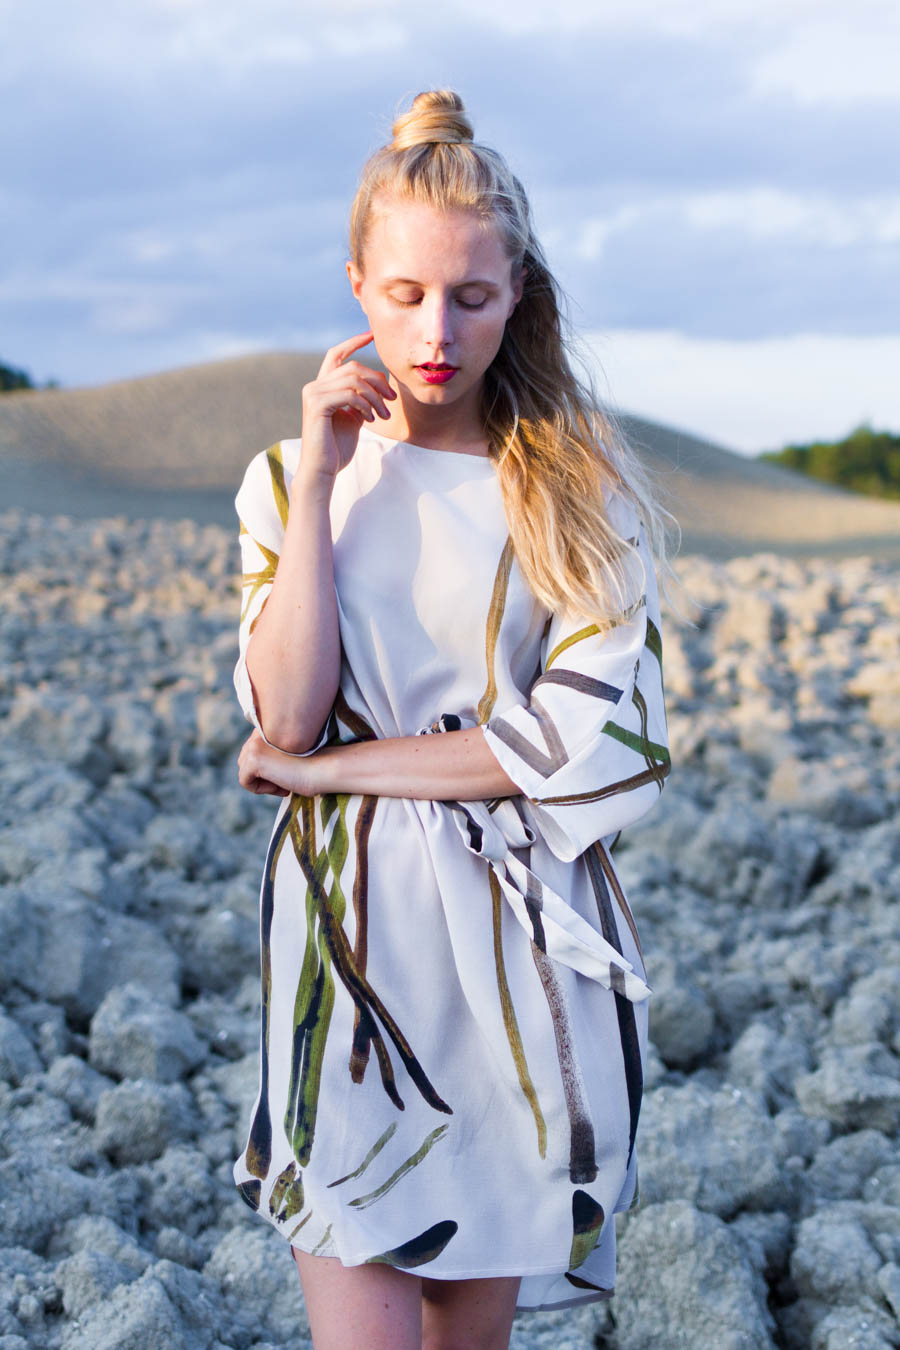 outfit-august-nemesis-babe-marie-jensen-danish-blogger-6-3